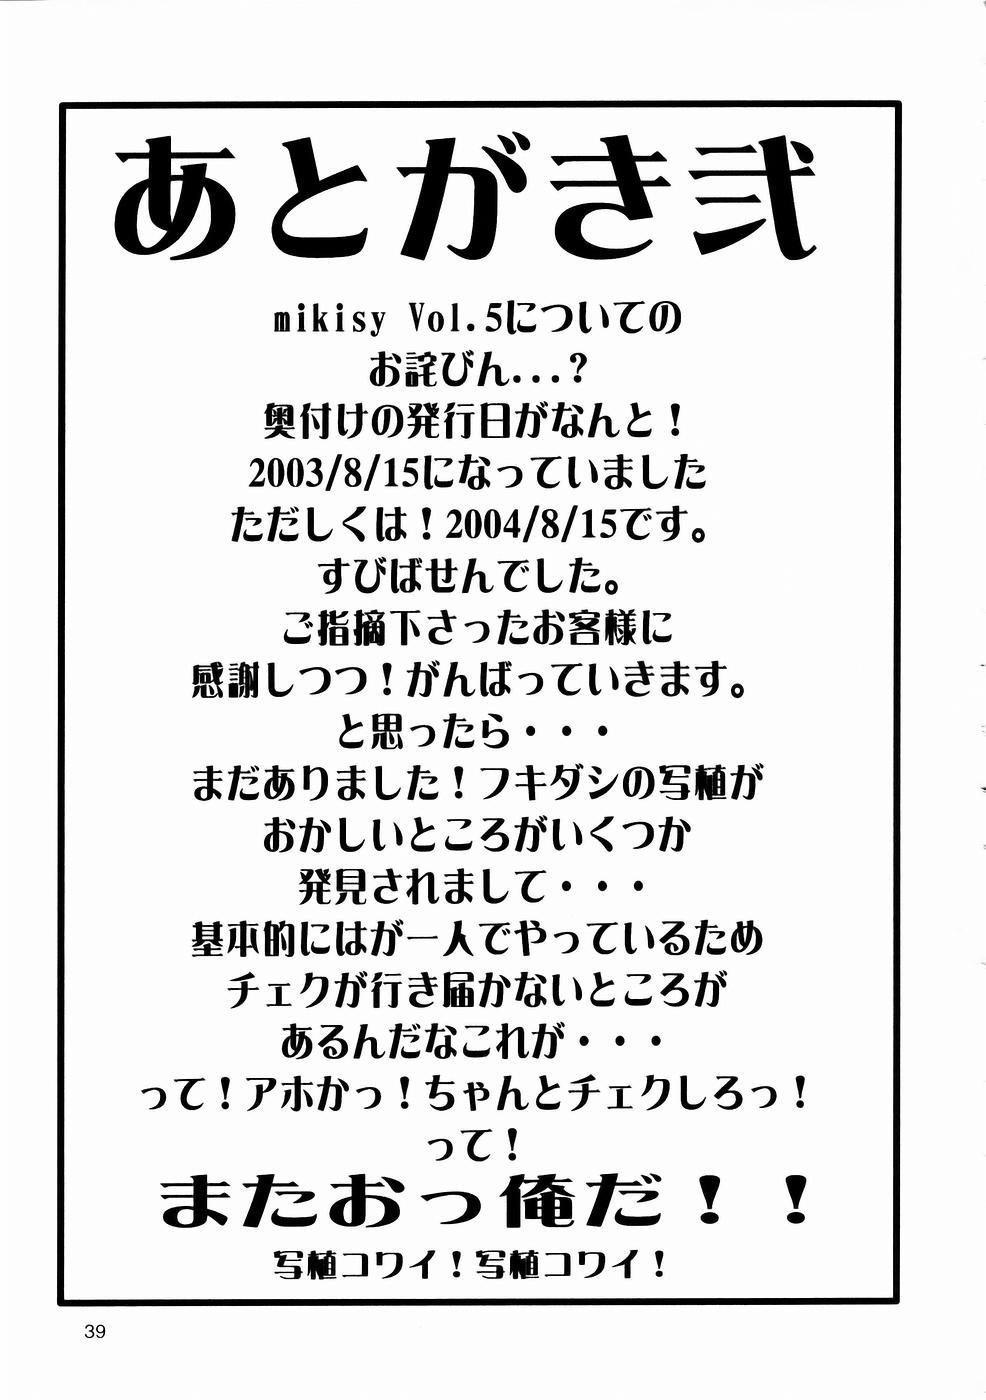 Mikisy Vol. 6 39